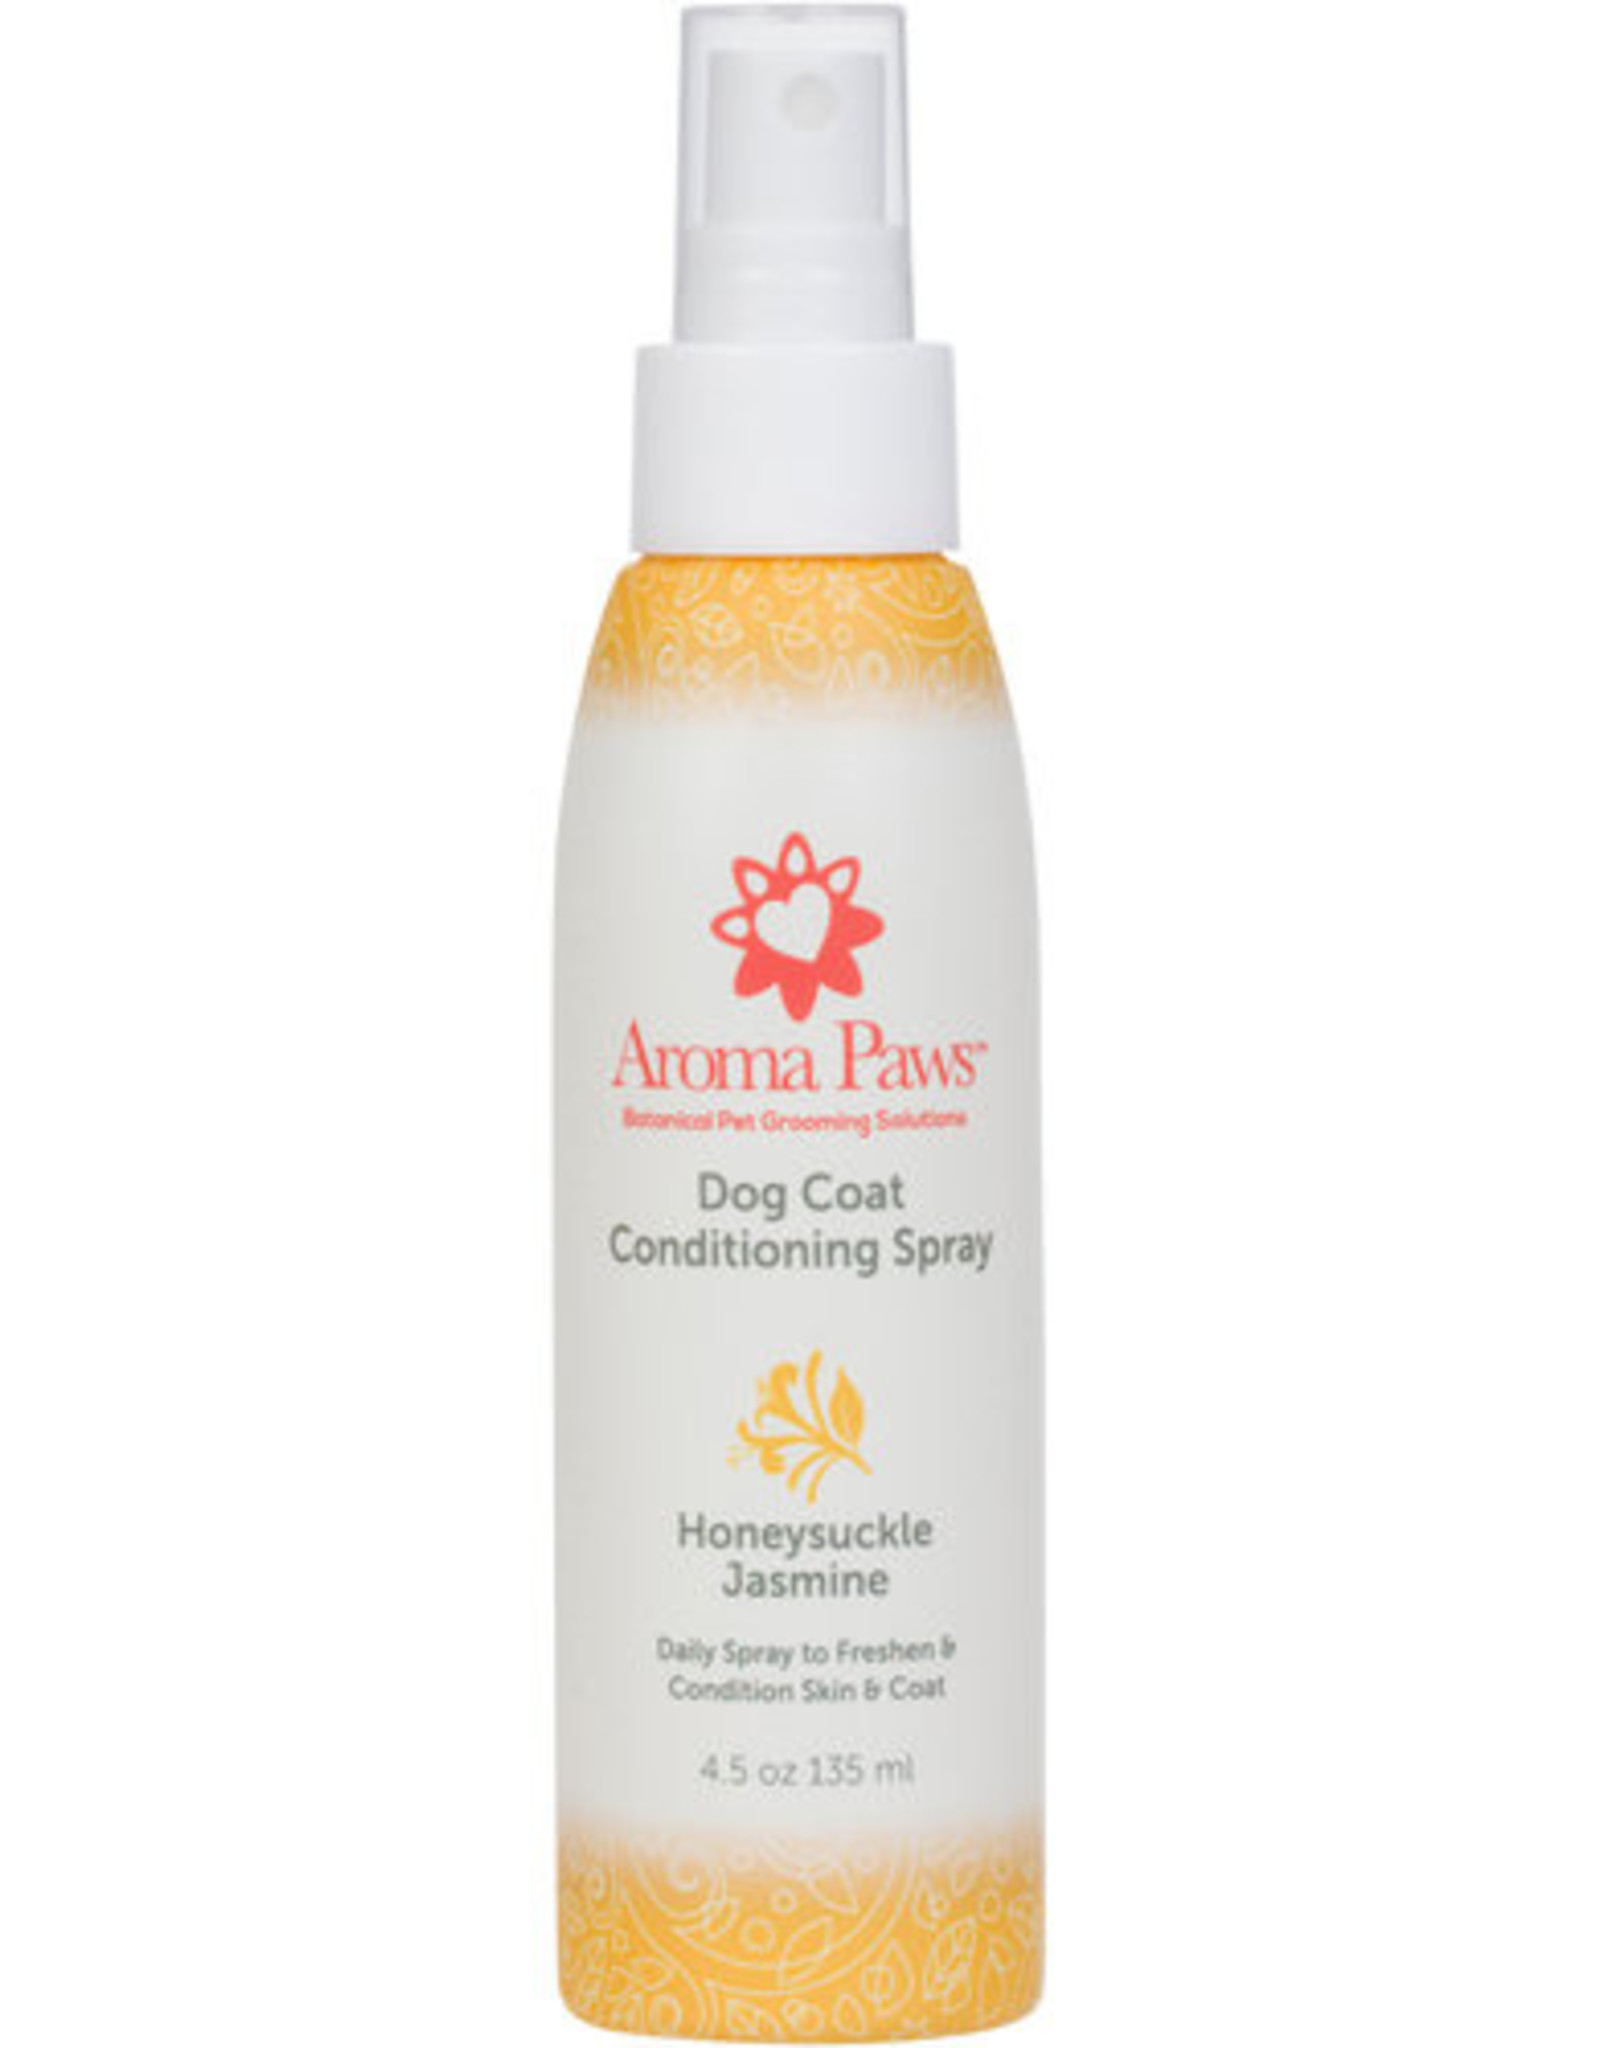 Aroma Paws Spray - Honeysuckle